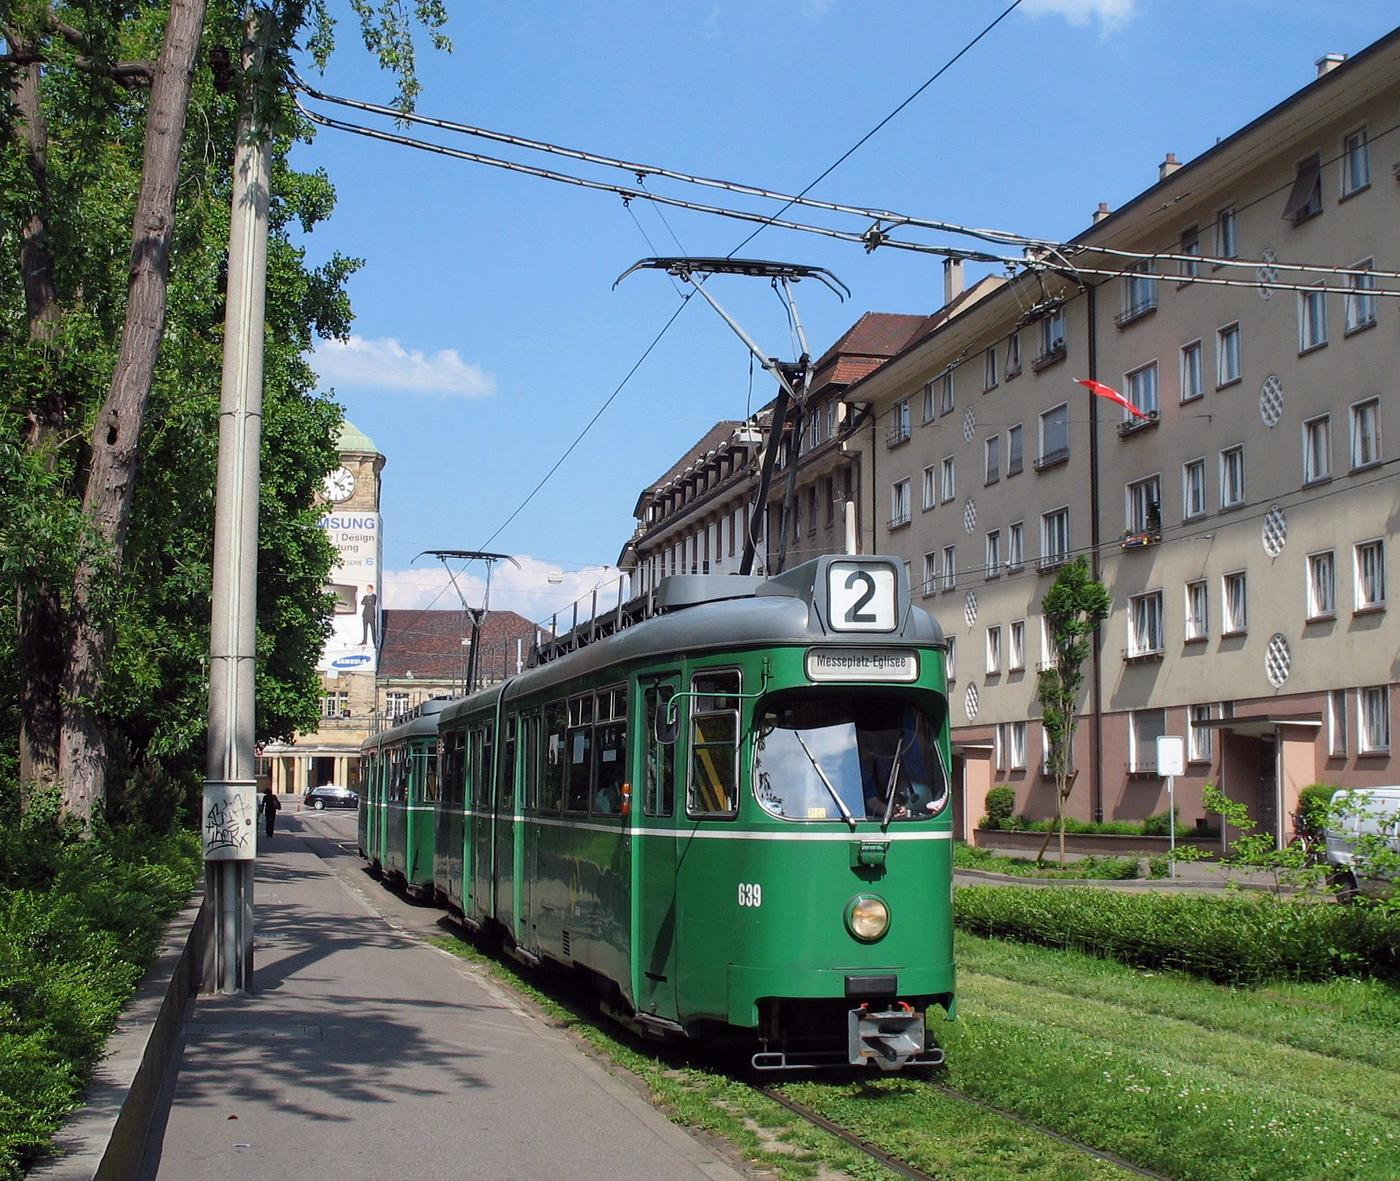 http://www.eisenbahn-im-bild.de/Temp/tram/CH_BS_IMG_5027.jpg